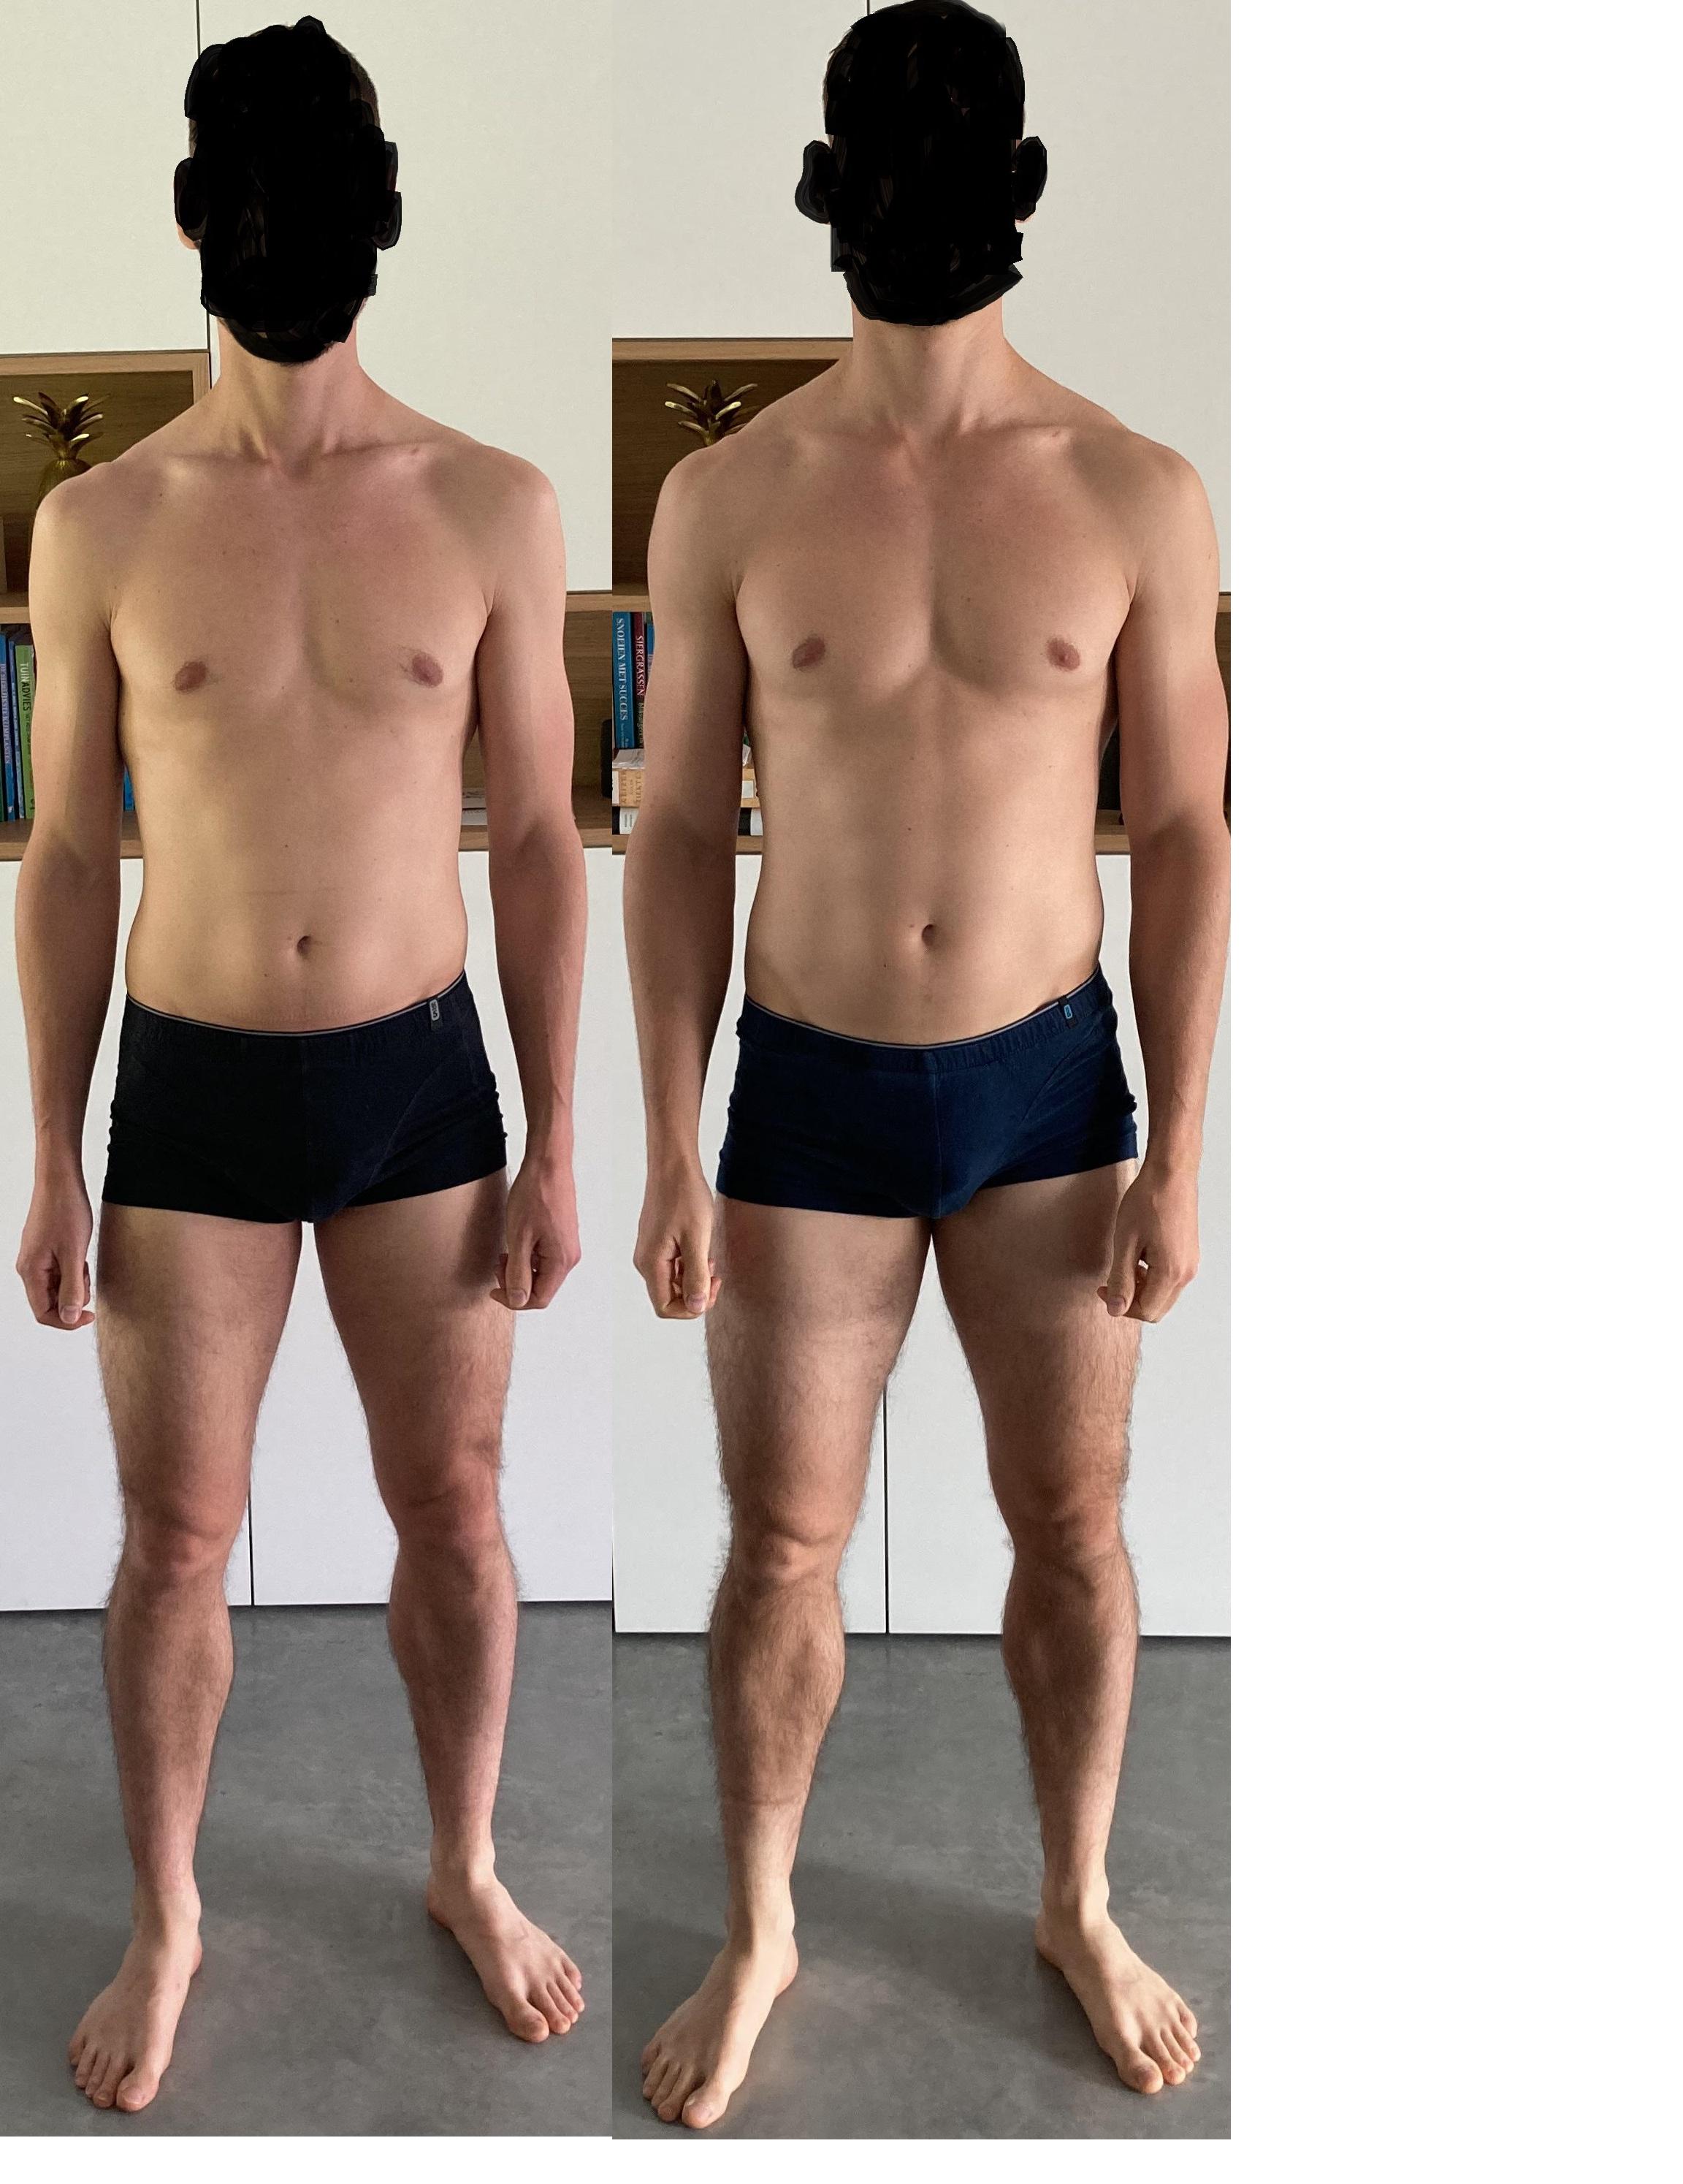 Progress Pics of 10 lbs Weight Gain 6 foot Male 165 lbs to 175 lbs